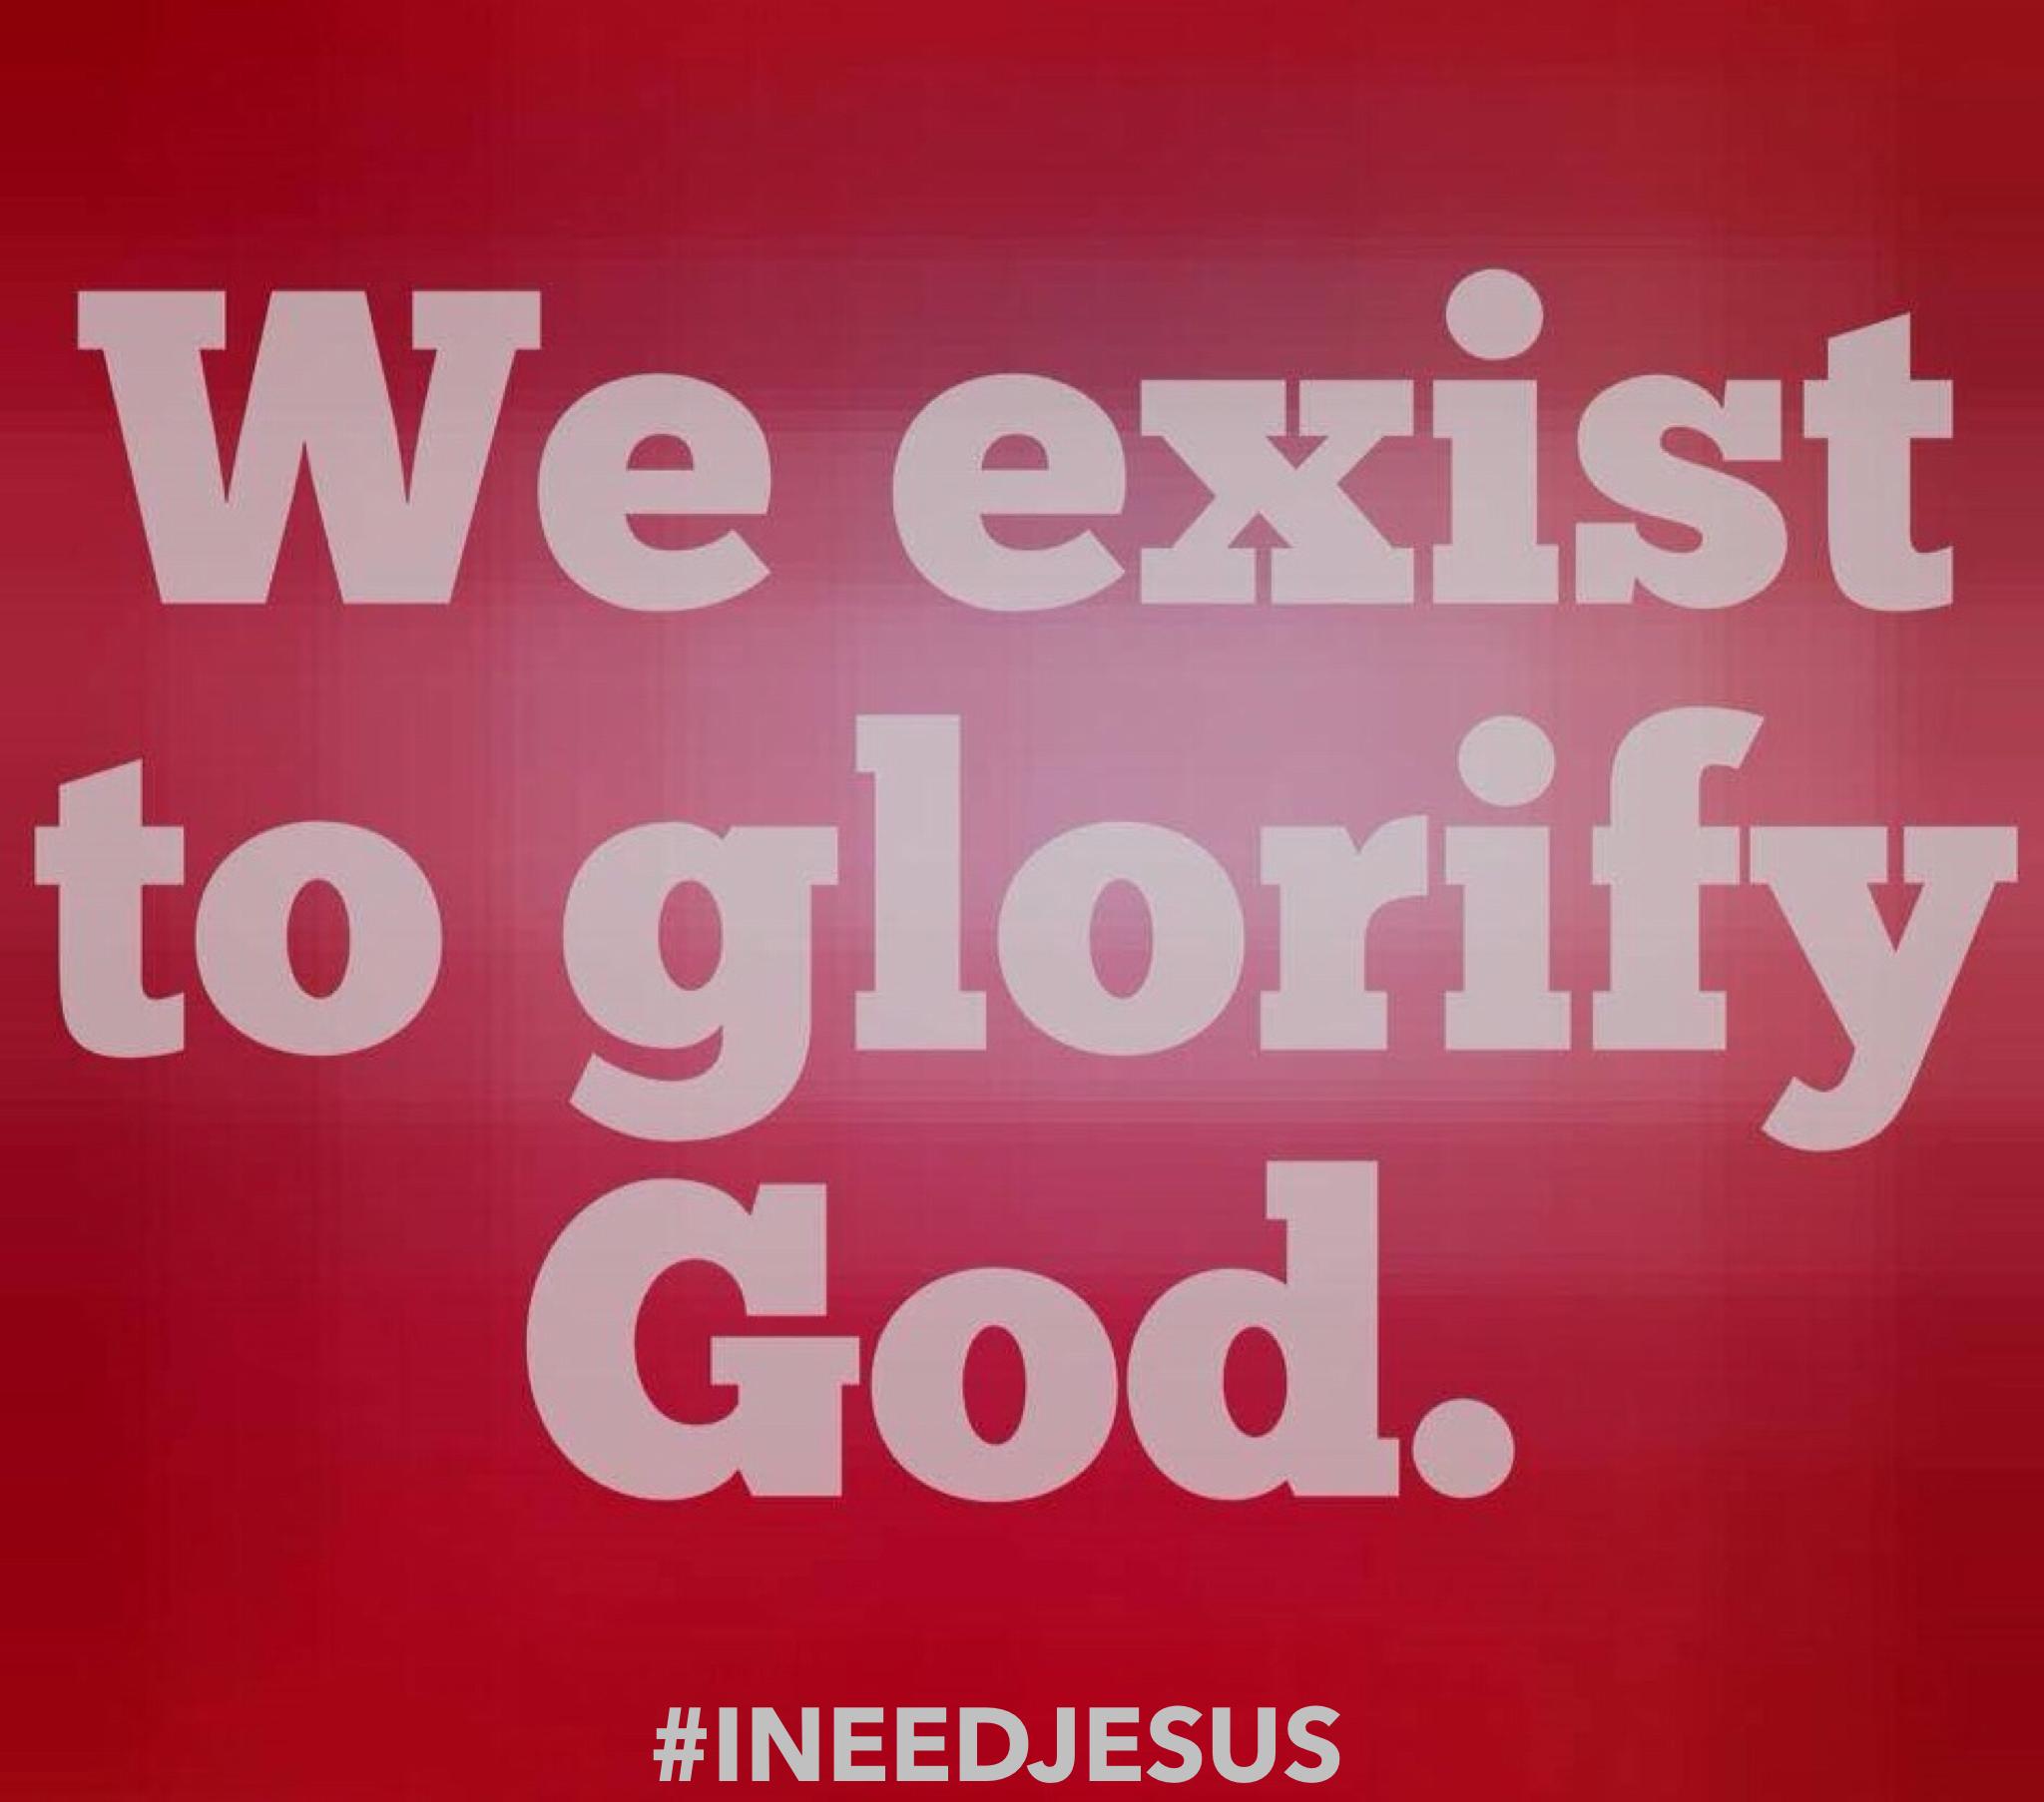 We exist to glorify God